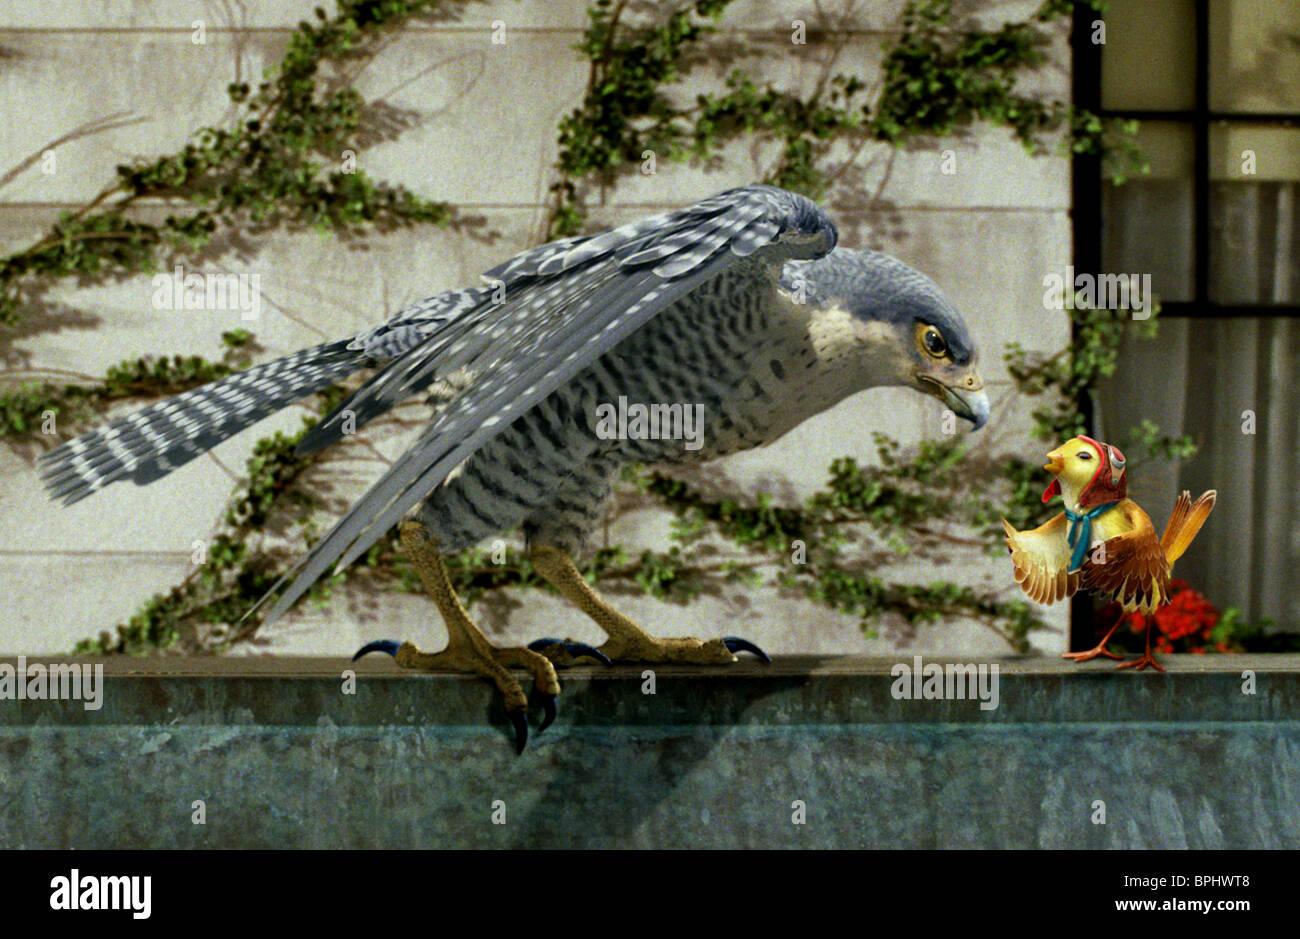 Falcon Margalo Stuart Little 2 2002 Stock Photo Alamy